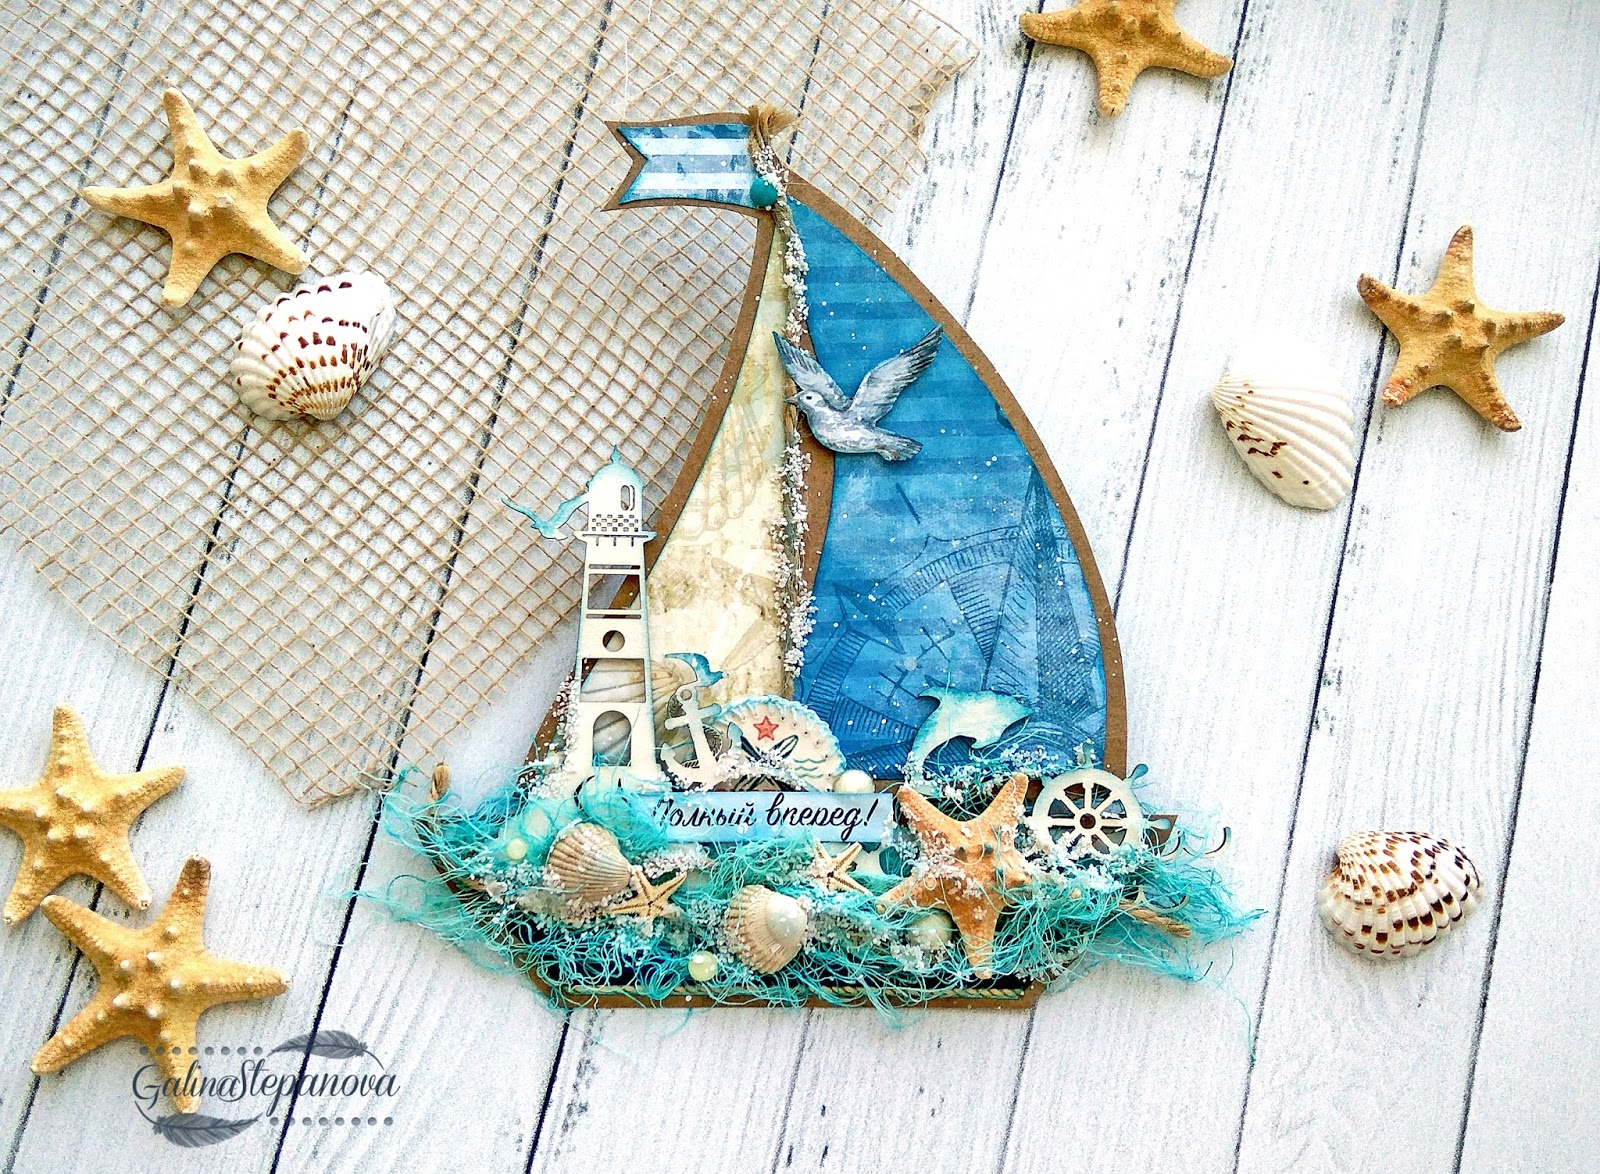 Открытки с днем рождения на морскую тематику